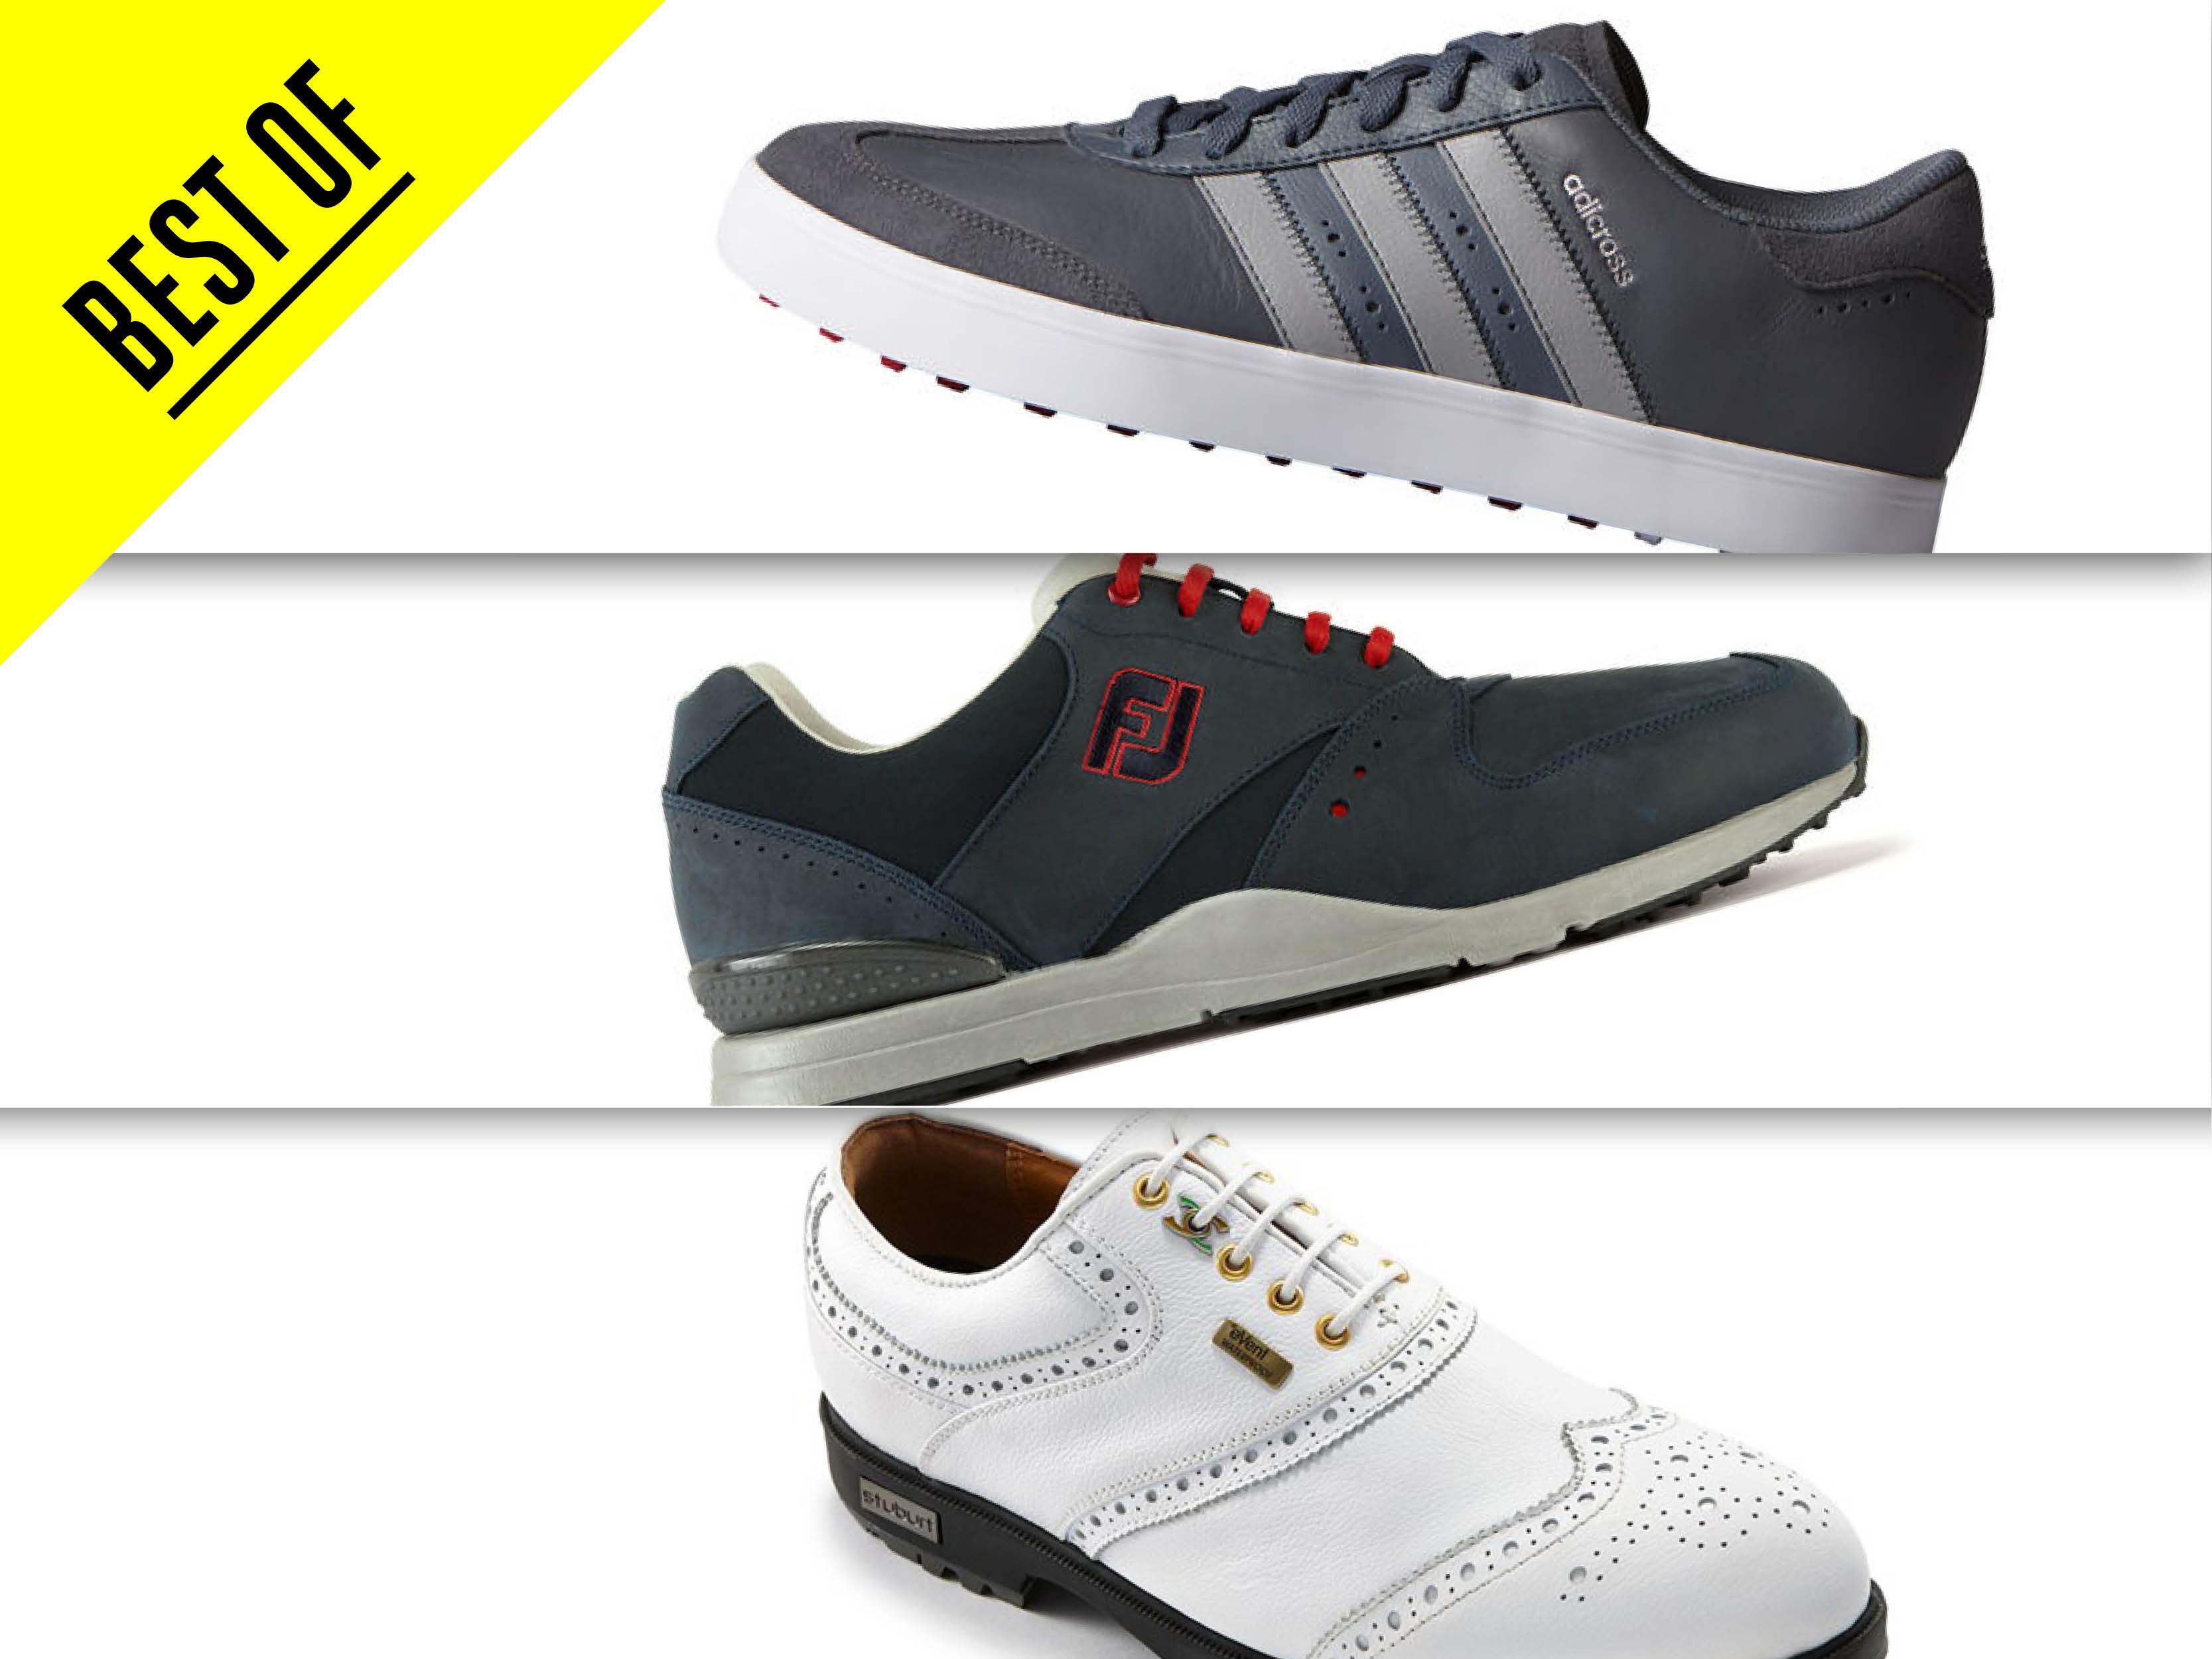 Best Budget Golf Shoes Uk